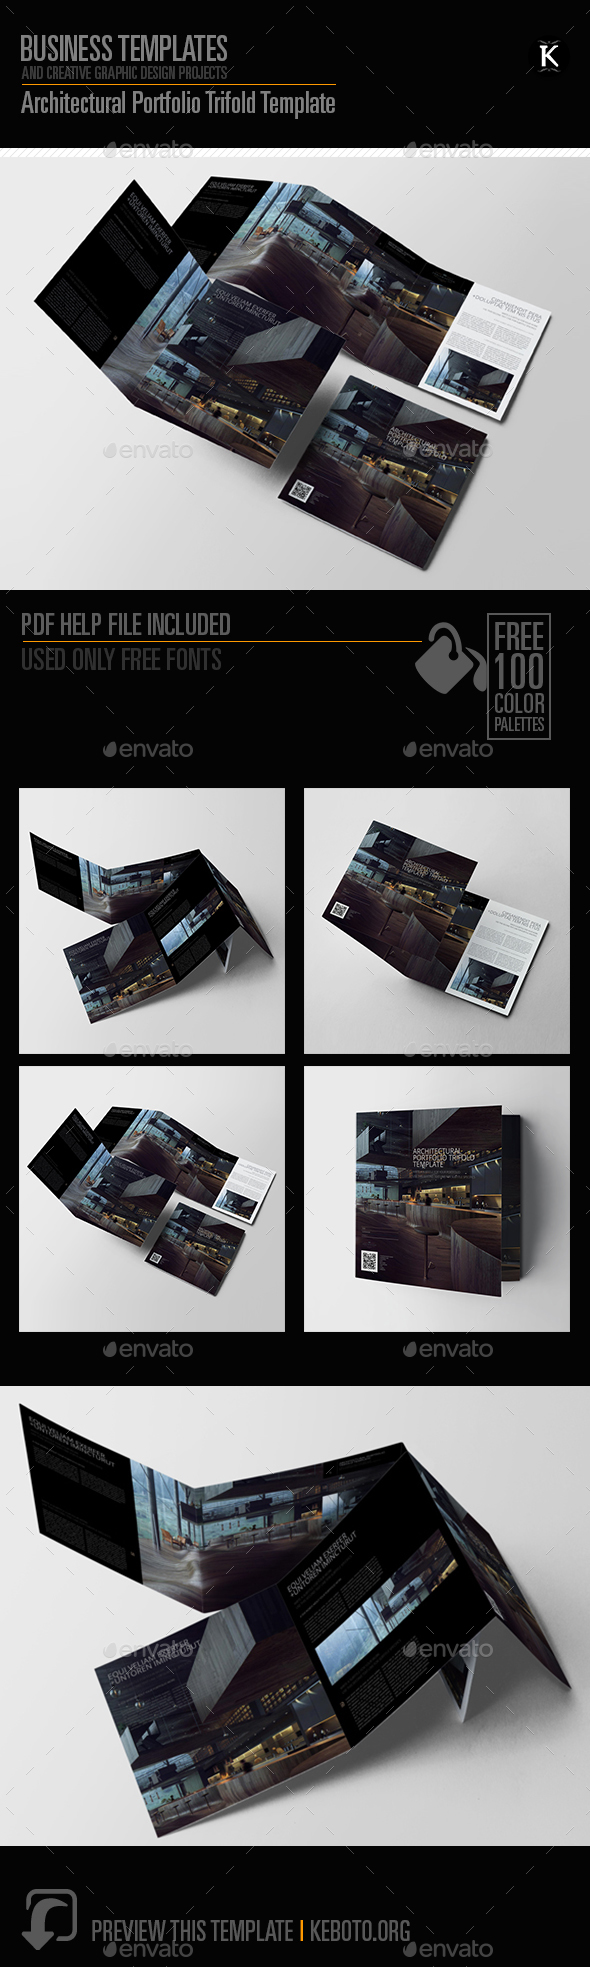 Architectural Portfolio Trifold Template - Portfolio Brochures